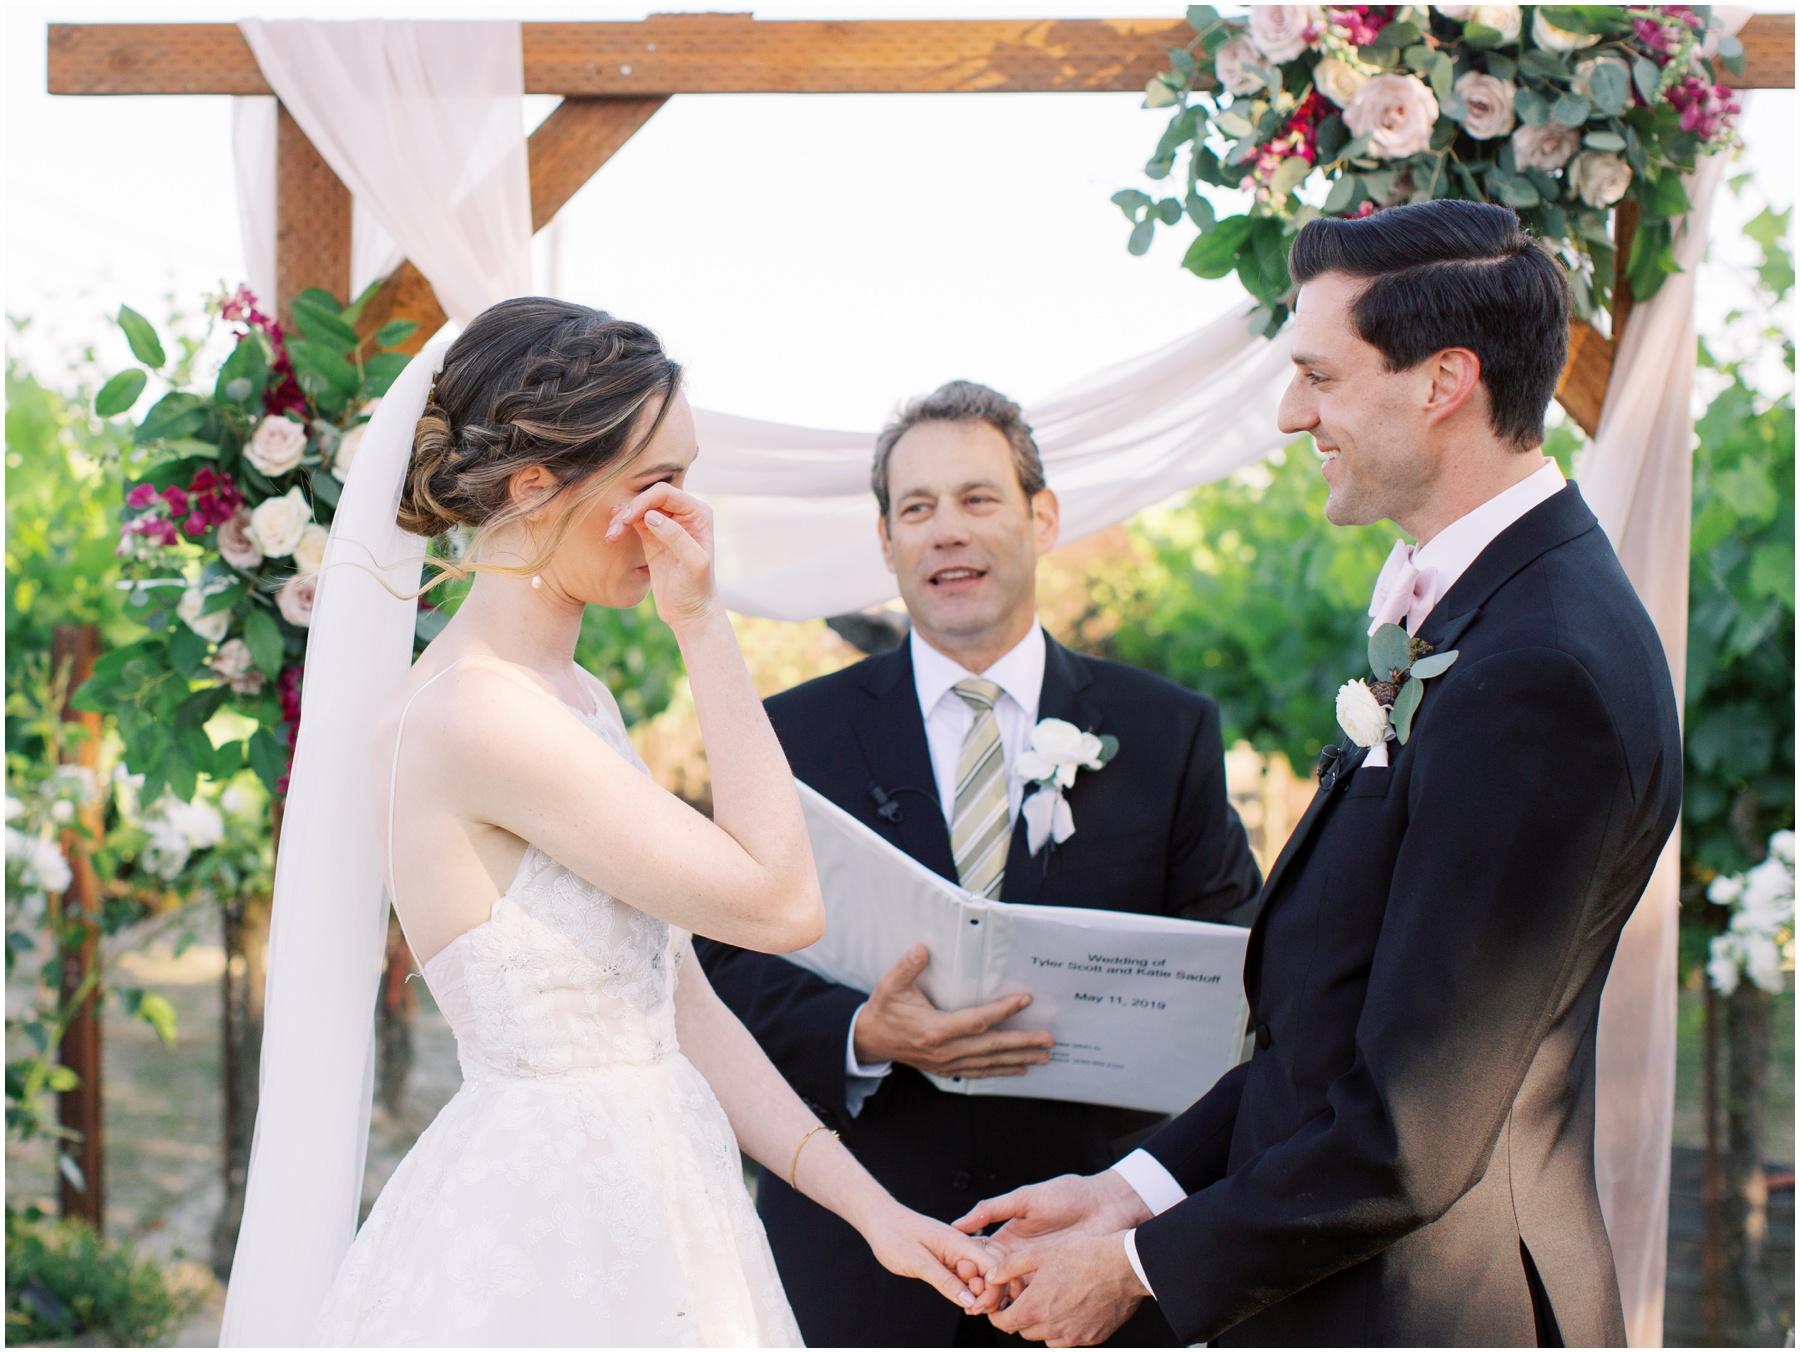 Scribner-bend-vineyards-wedding-sacramento-california-Kristine-Herman-Photography-232.jpg